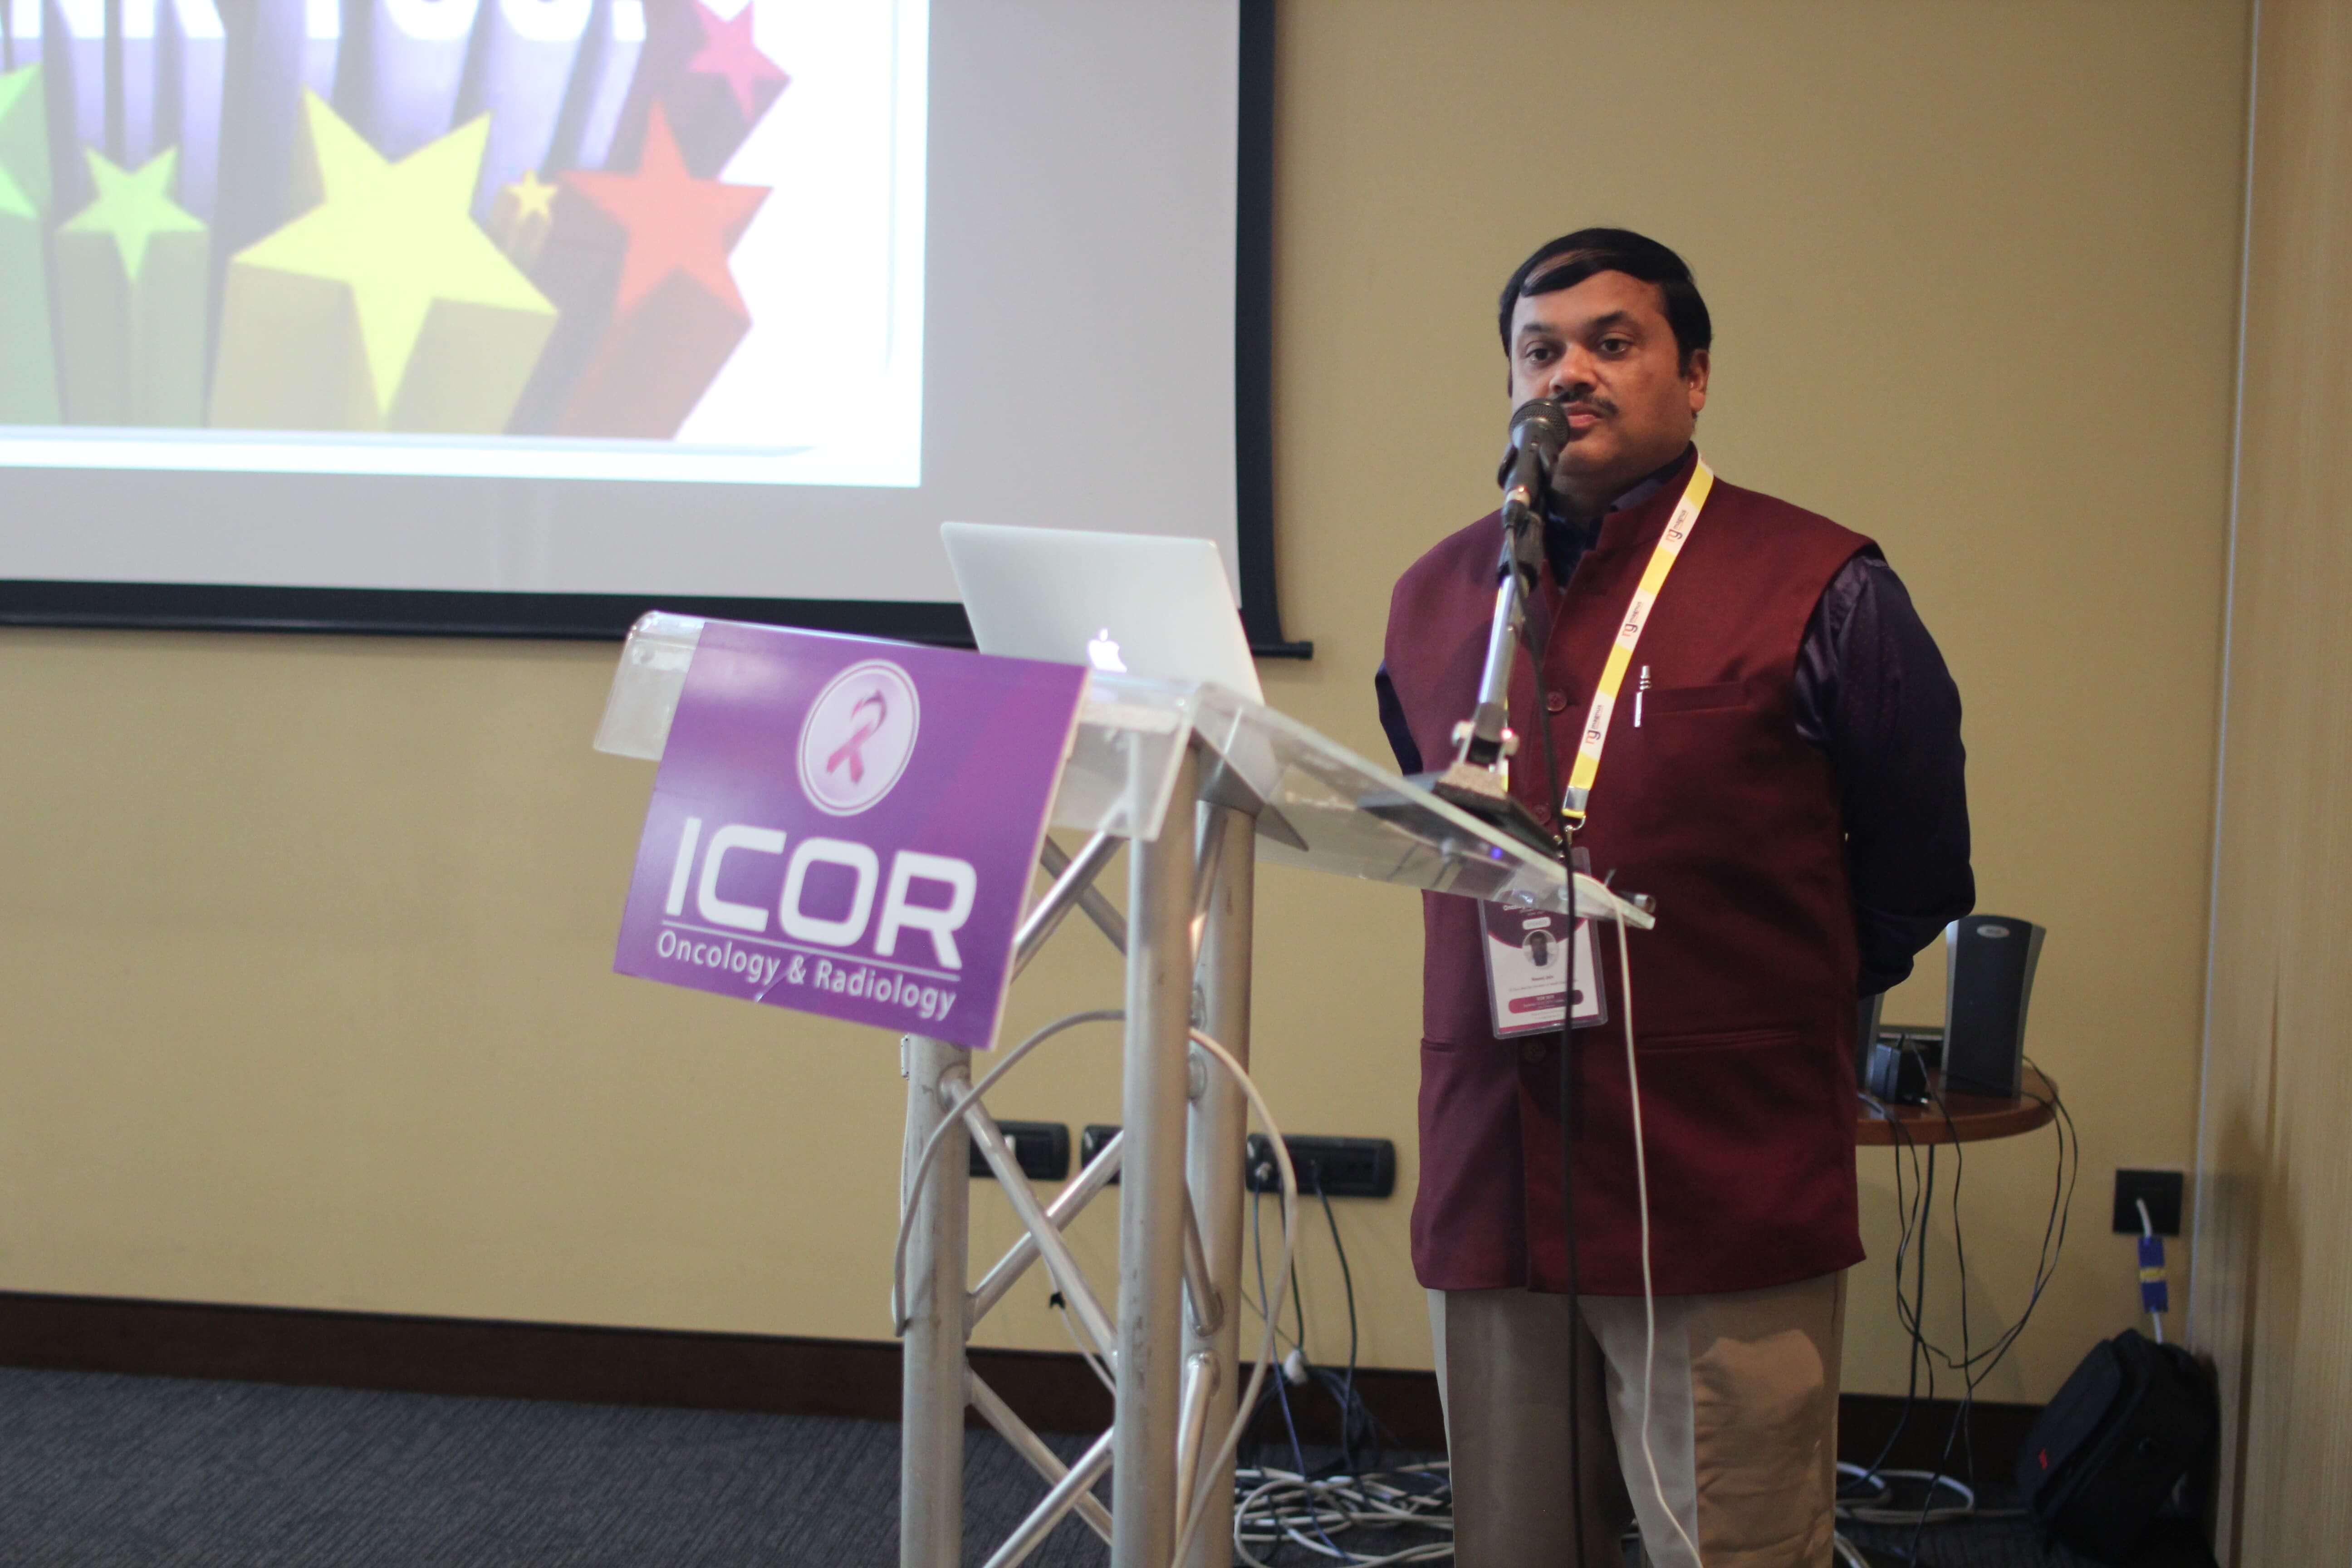 Cancer education conferences - Neeraj Jain